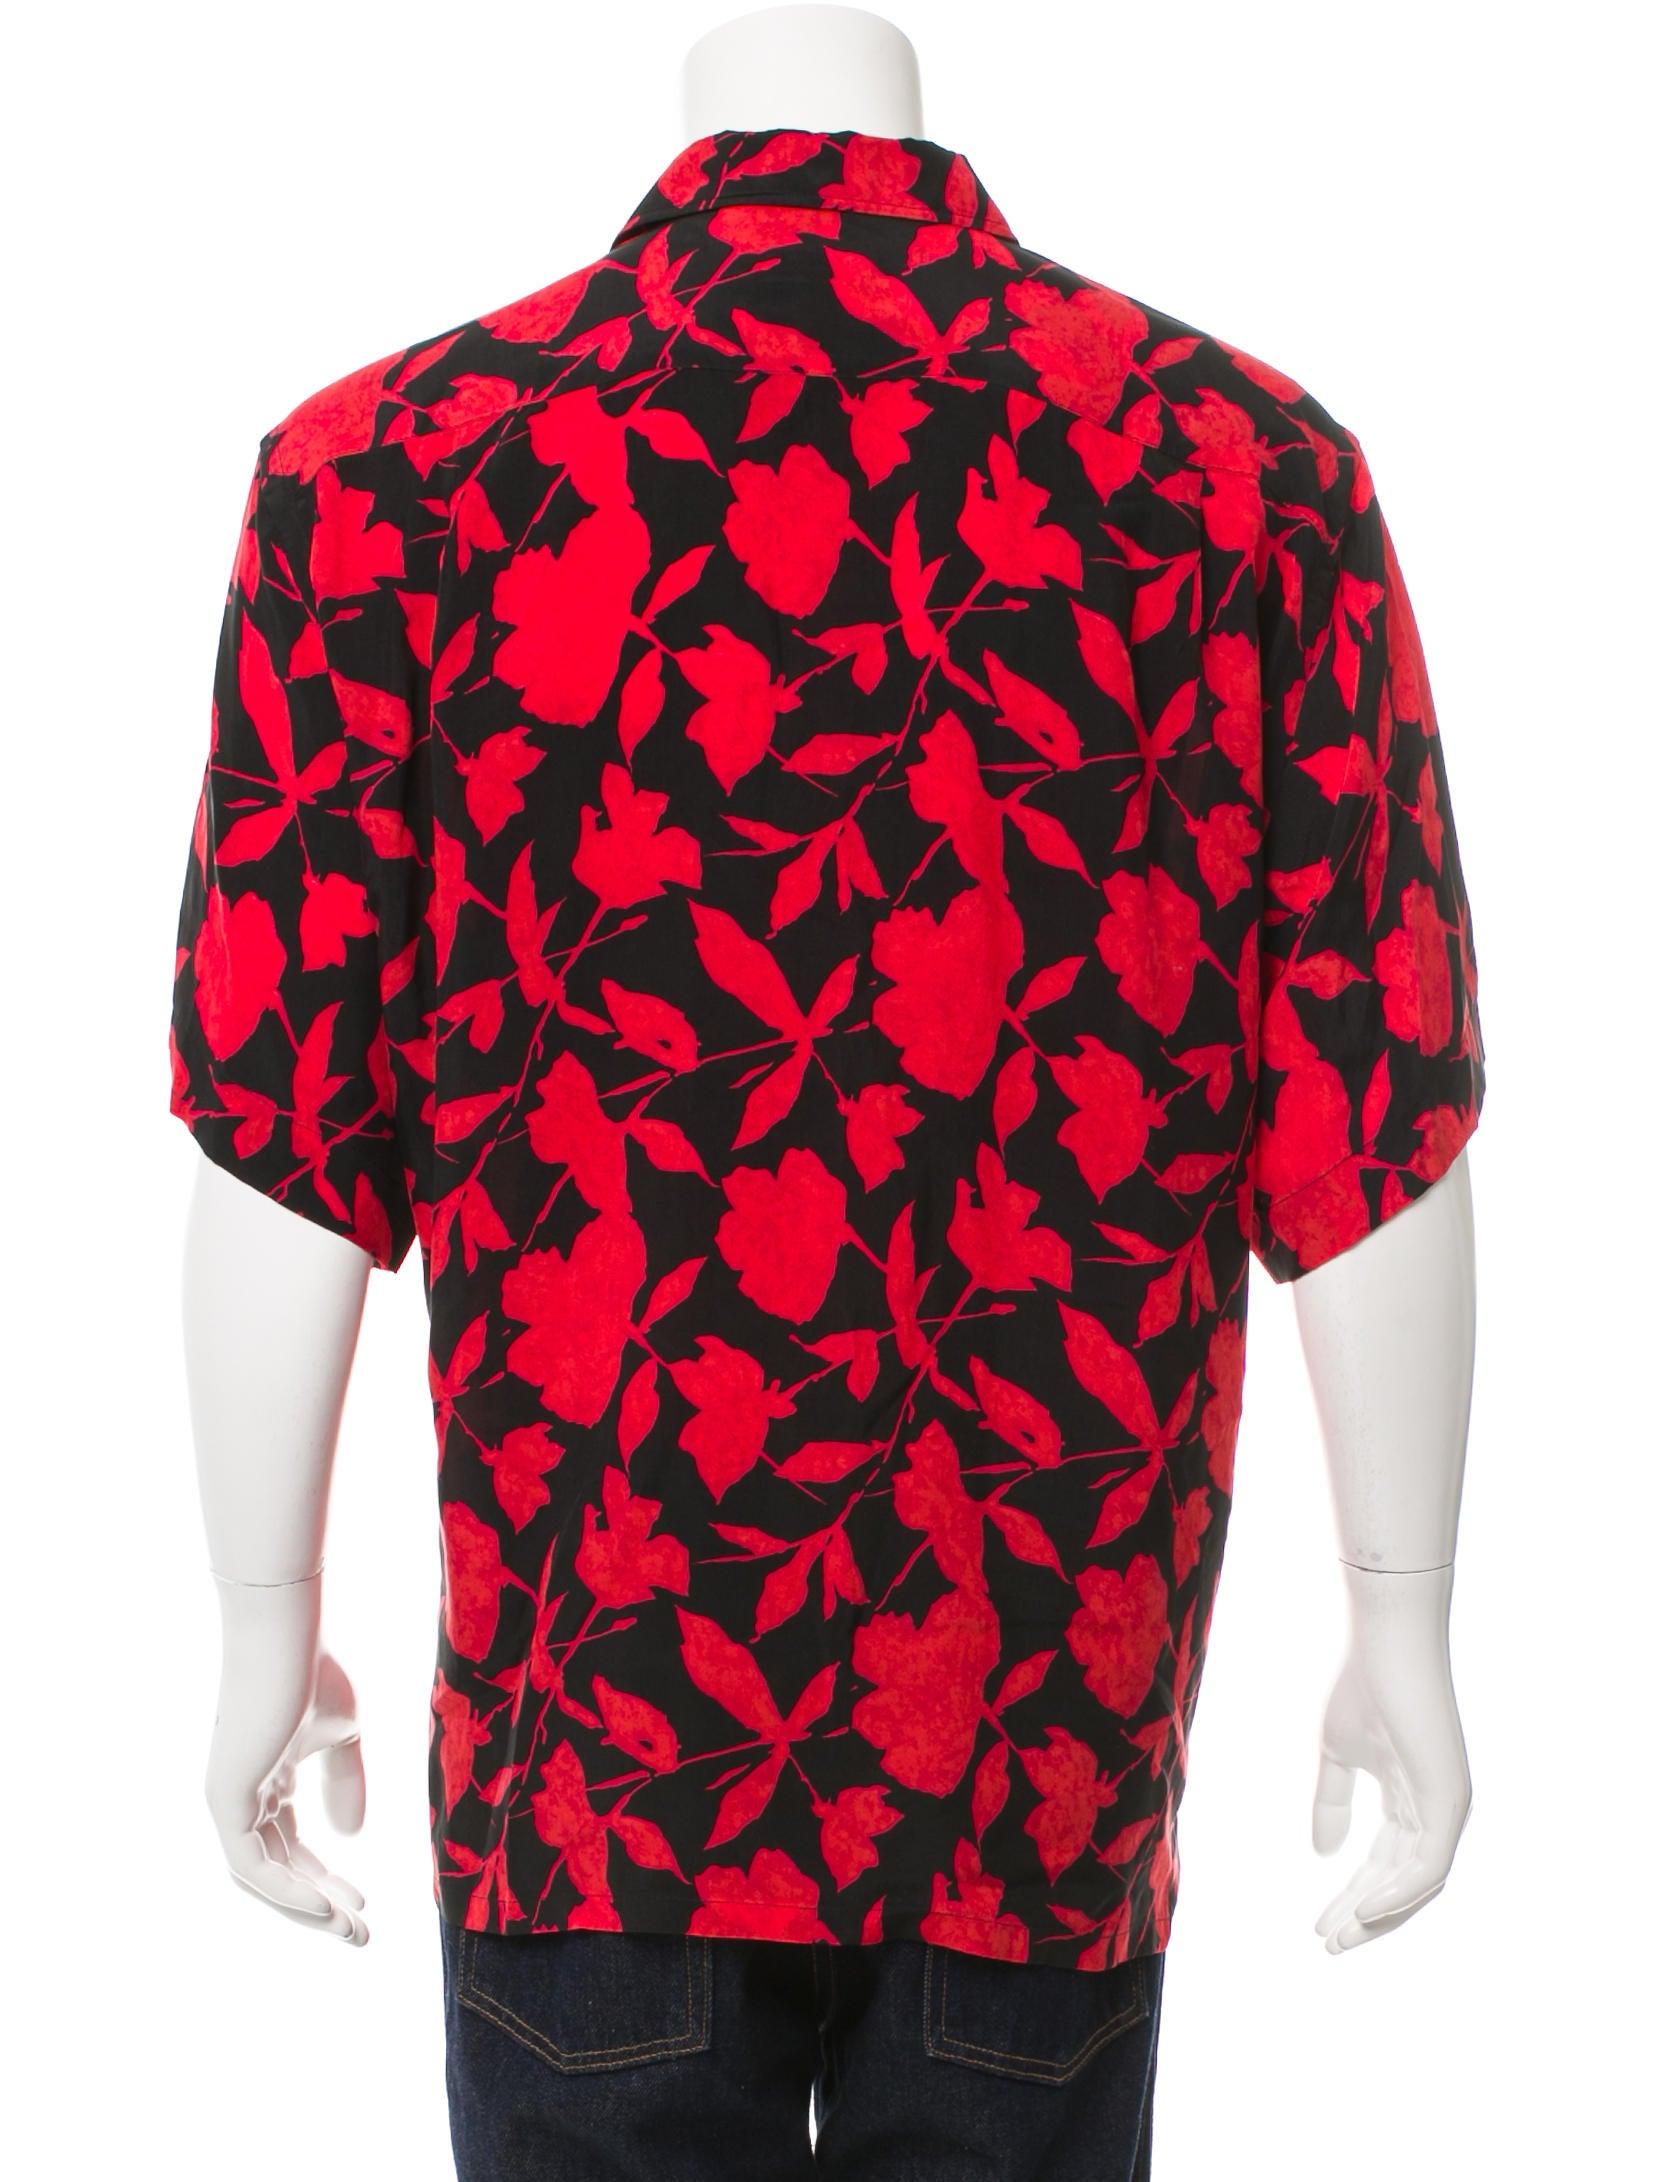 Brioni floral print button up shirt clothing bro21430 for Floral print button up shirt